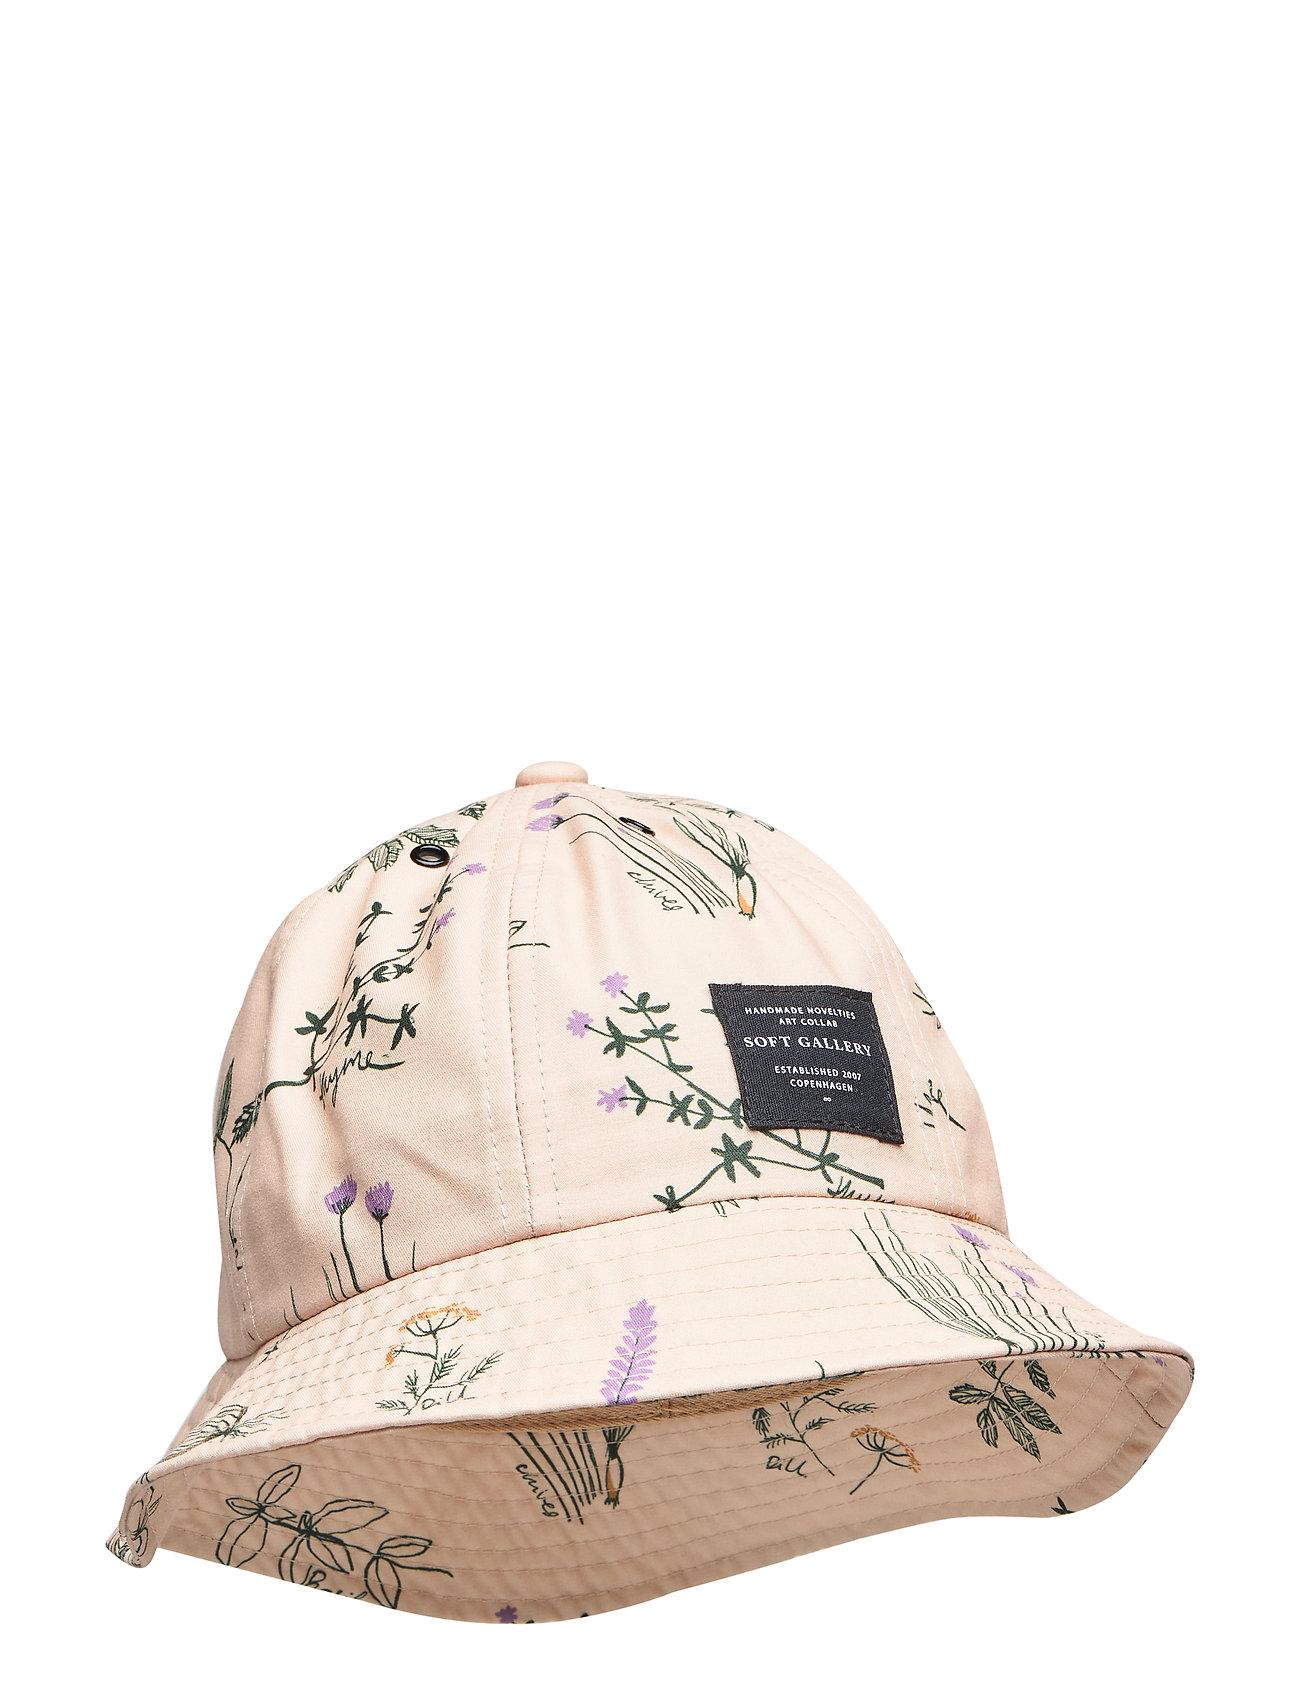 Soft Gallery Fico Hat - WINTER WHEAT, AOP HEALING HERBS